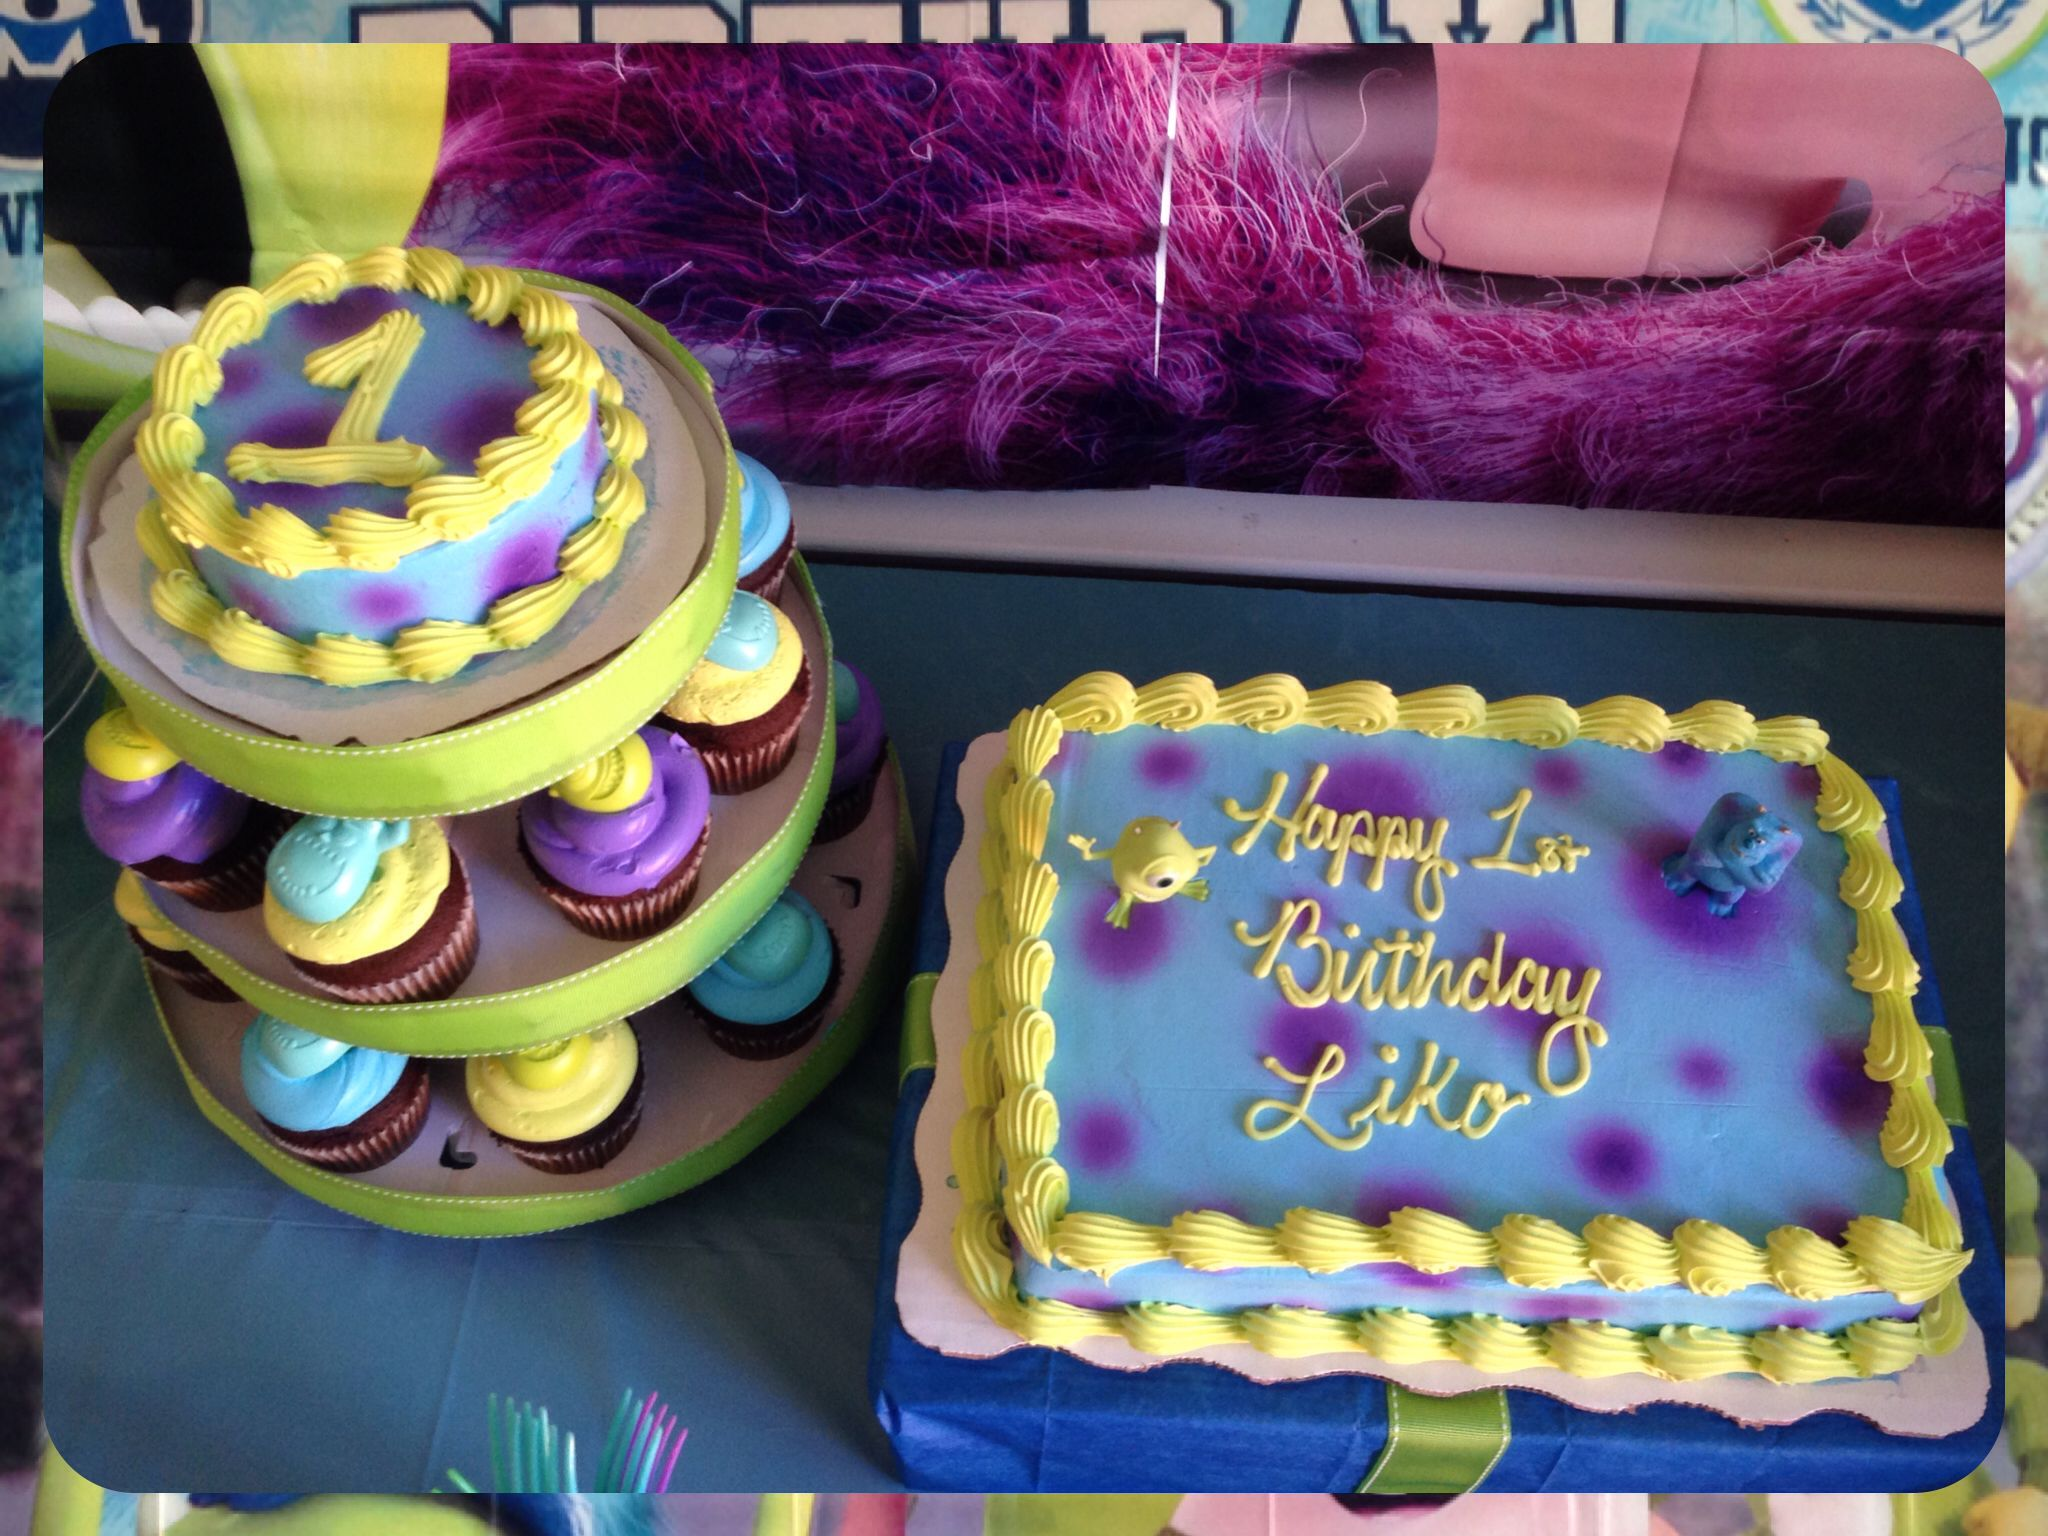 Groovy Likos First Birthday Cake Smash Cake Cupcakes Cheap Cute Funny Birthday Cards Online Elaedamsfinfo